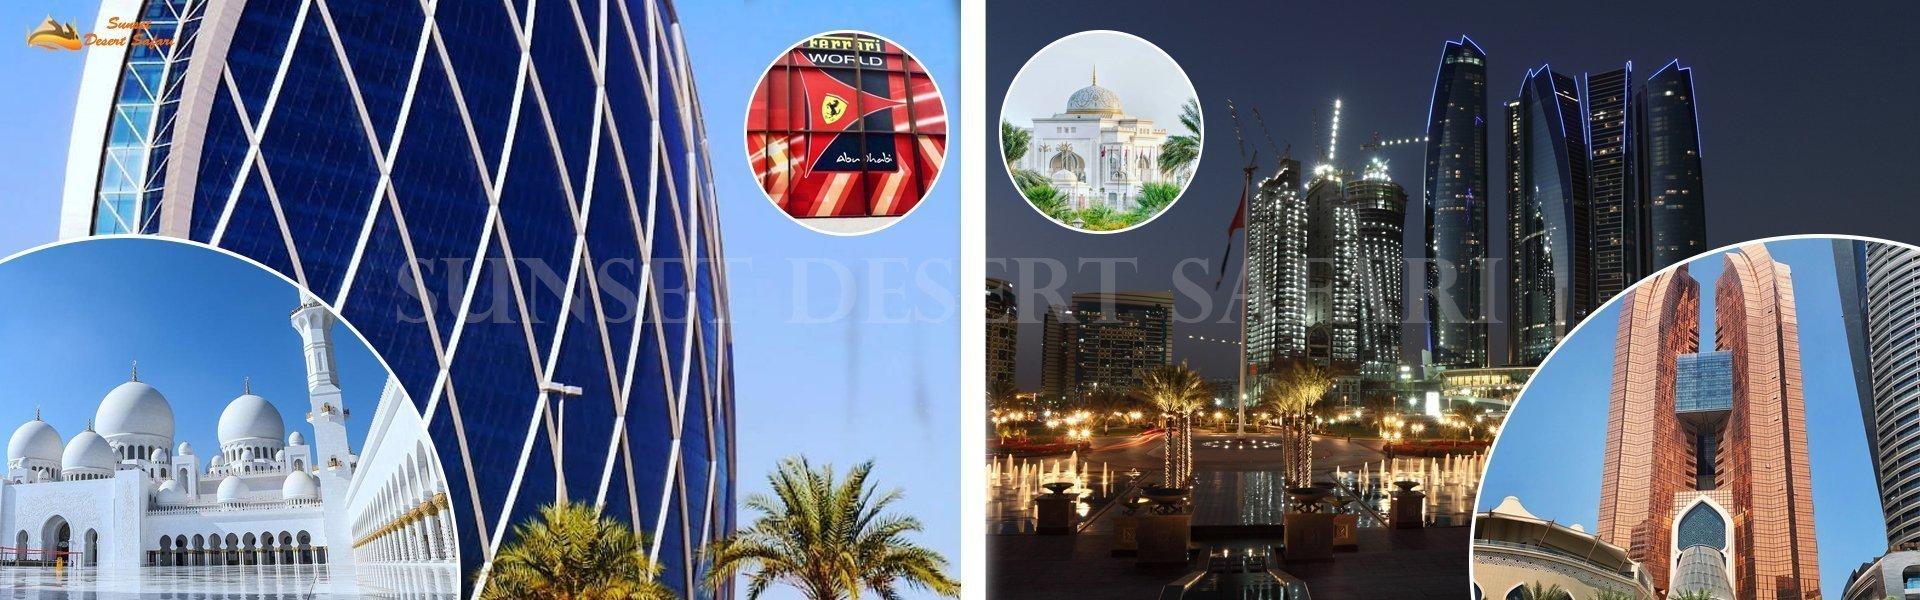 Abu Dhabi Tour, Ferrari world